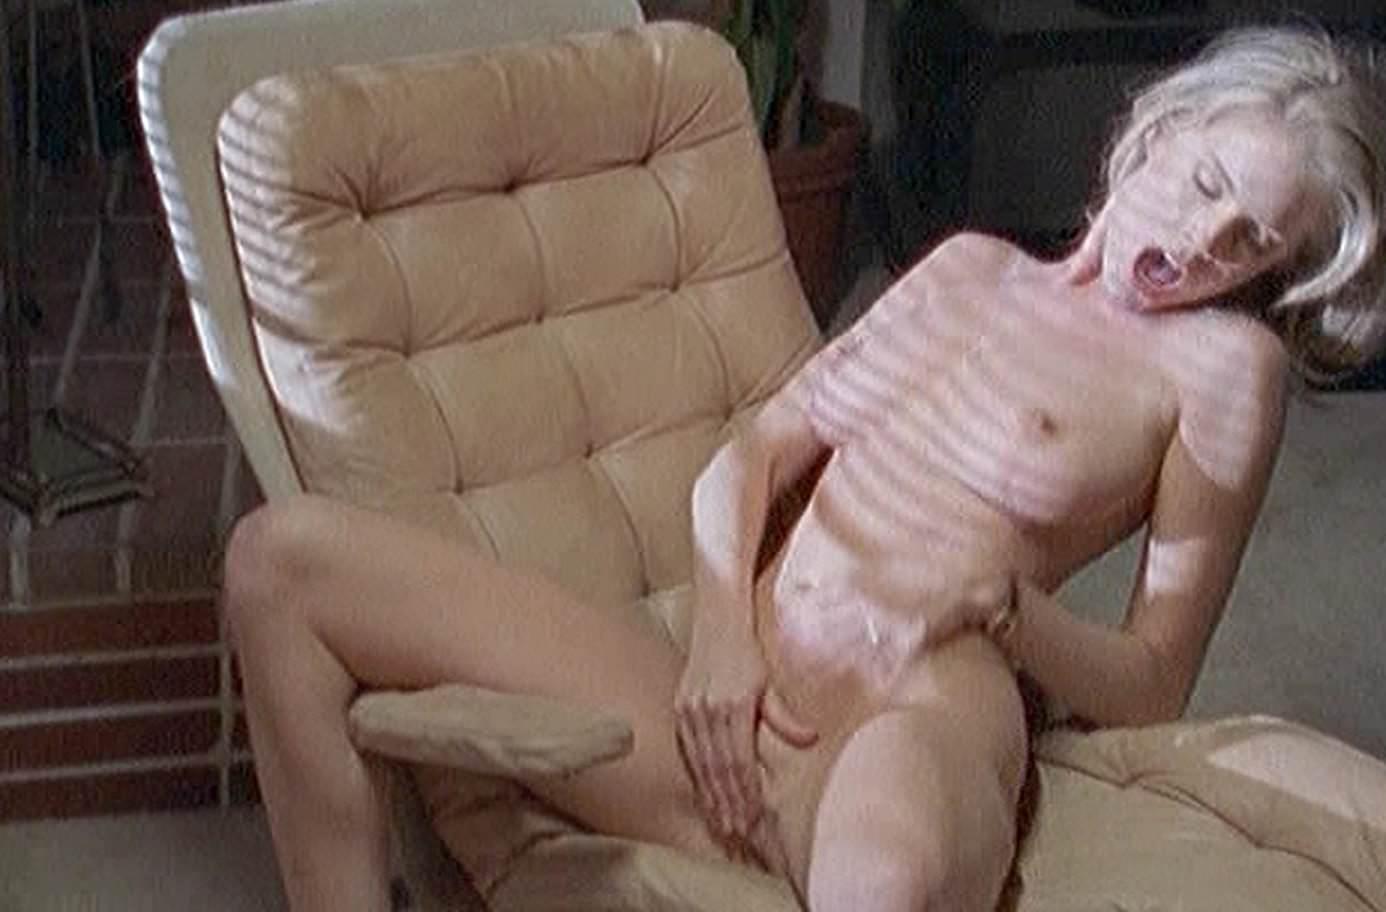 Porn tracy videos ryan